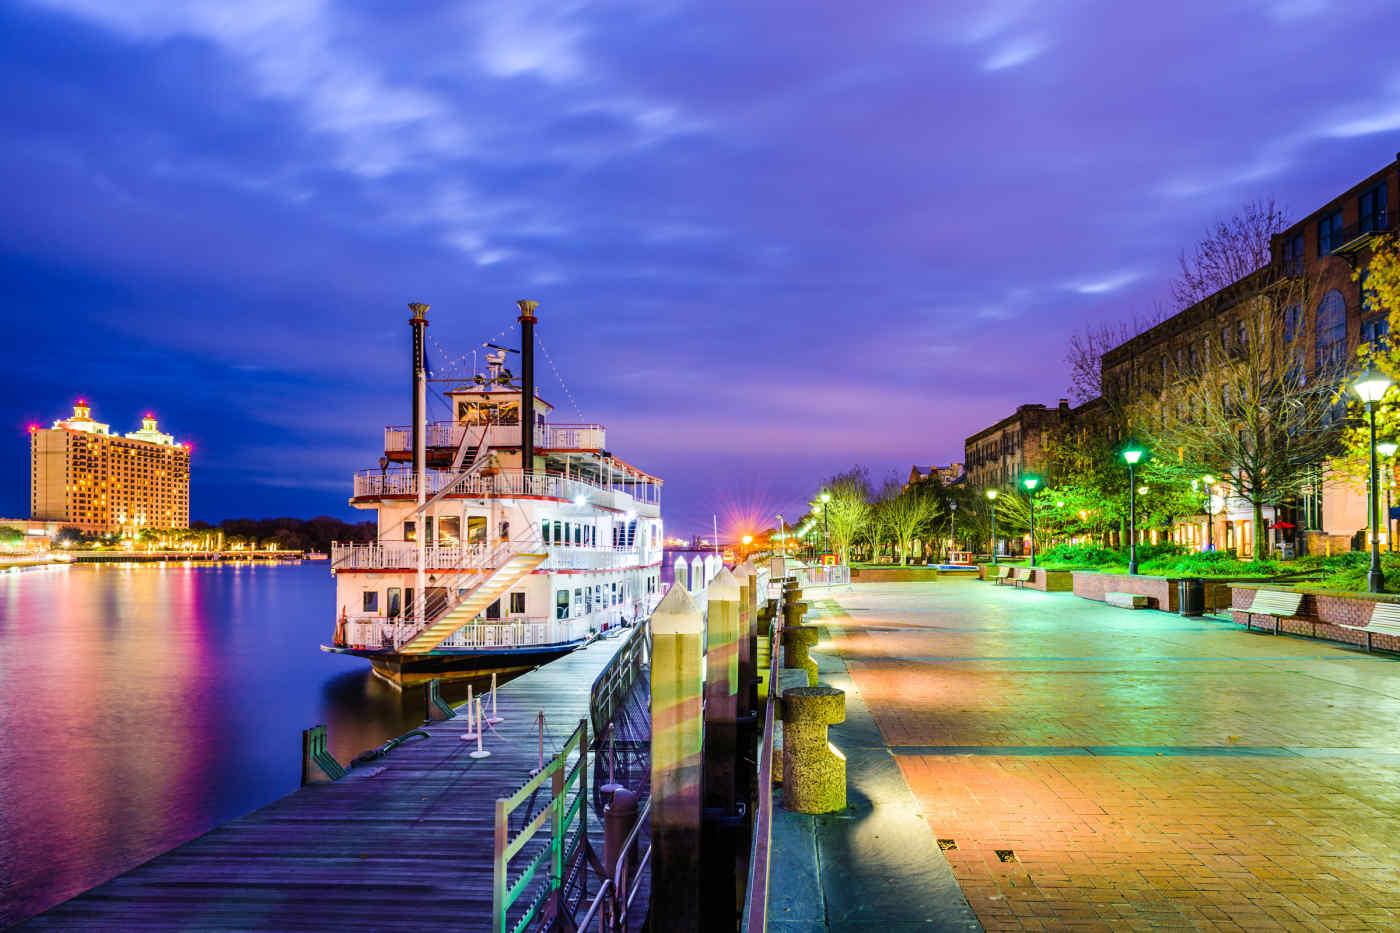 Savannah, Geogia Riverfront Promenade